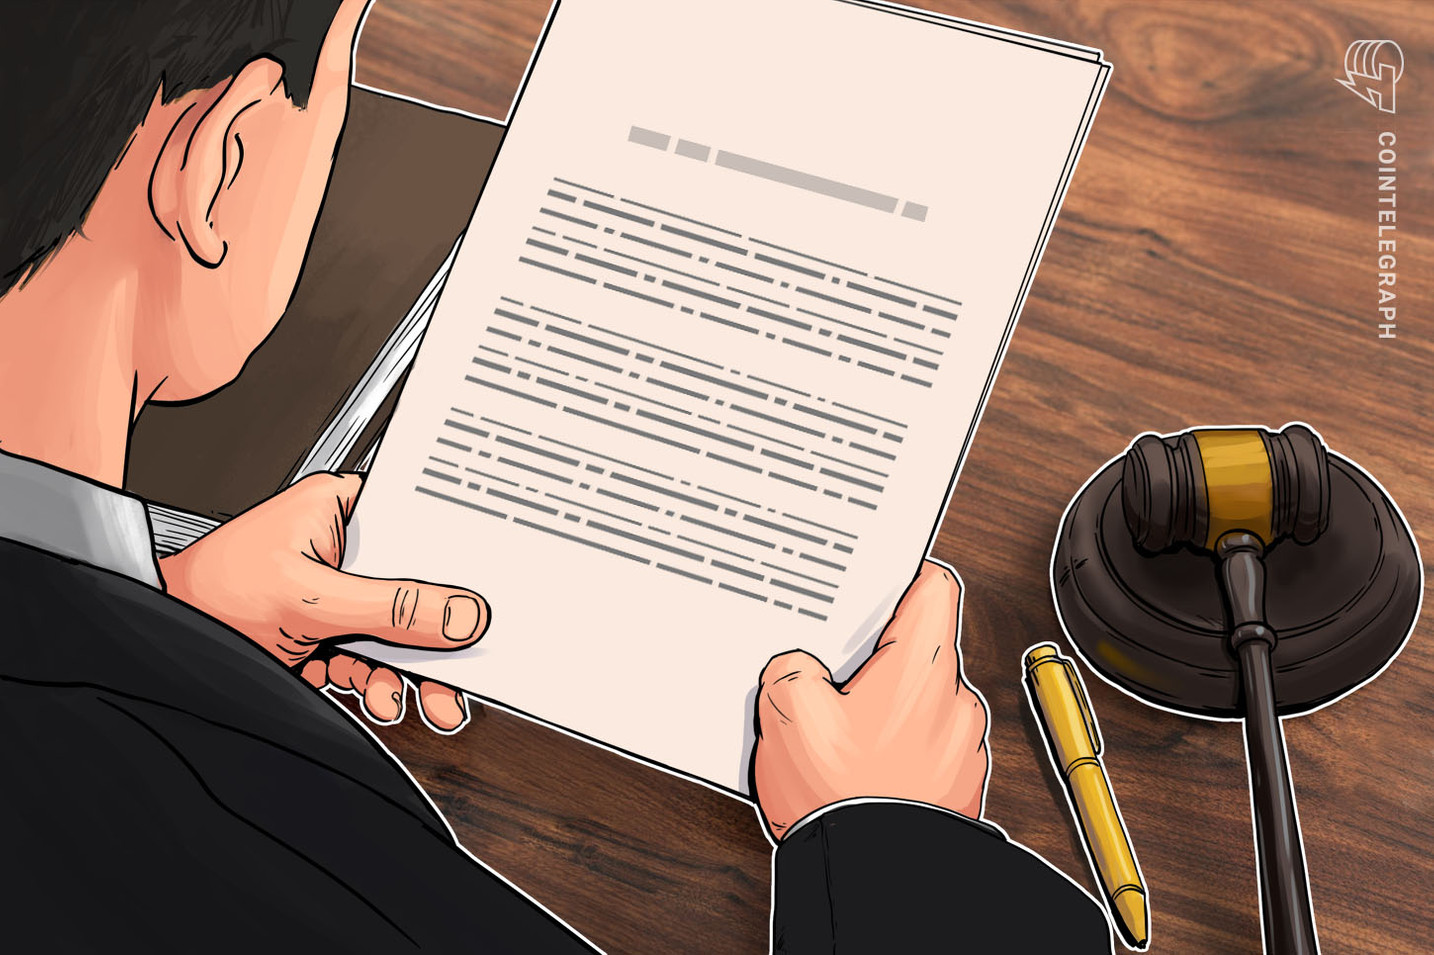 Antigua inversionista demanda al esquema OneCoin, busca acción de clase